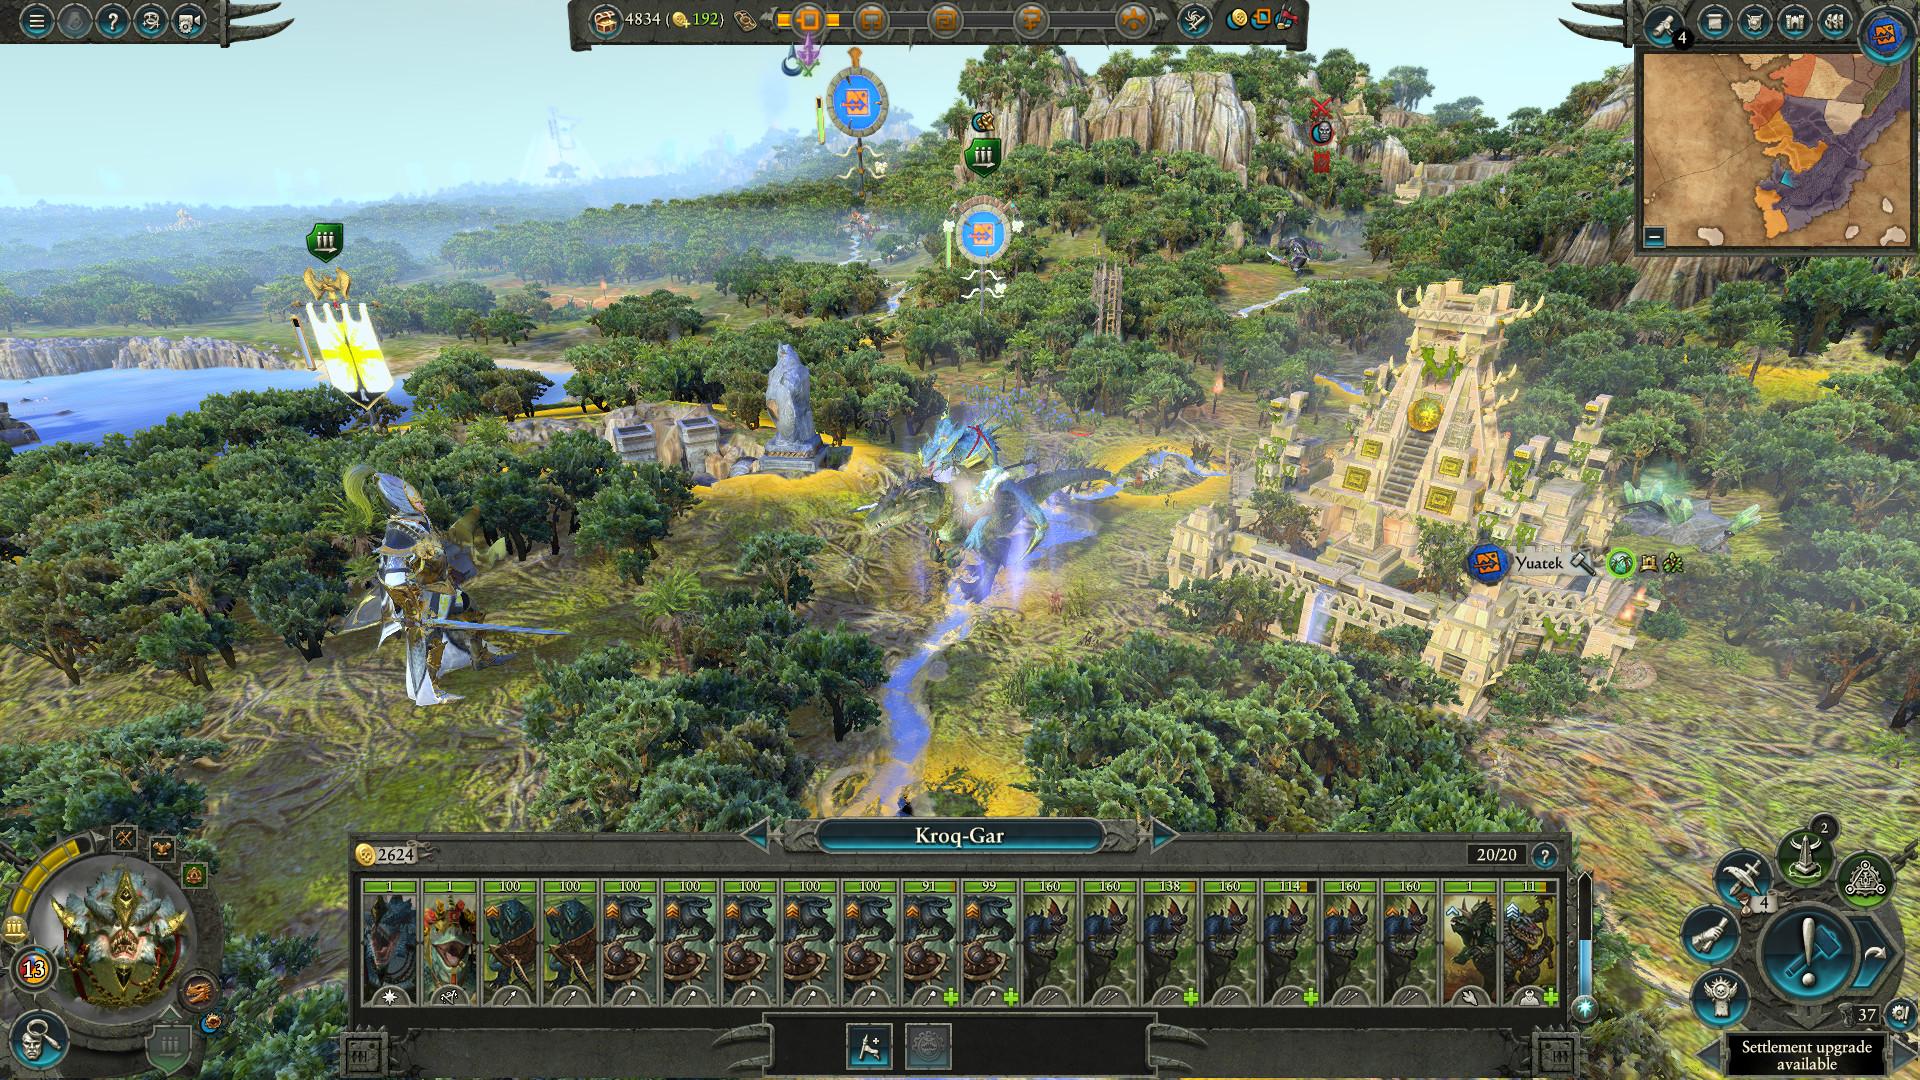 shogun total war 2 multiplayer campaign 3 player mod